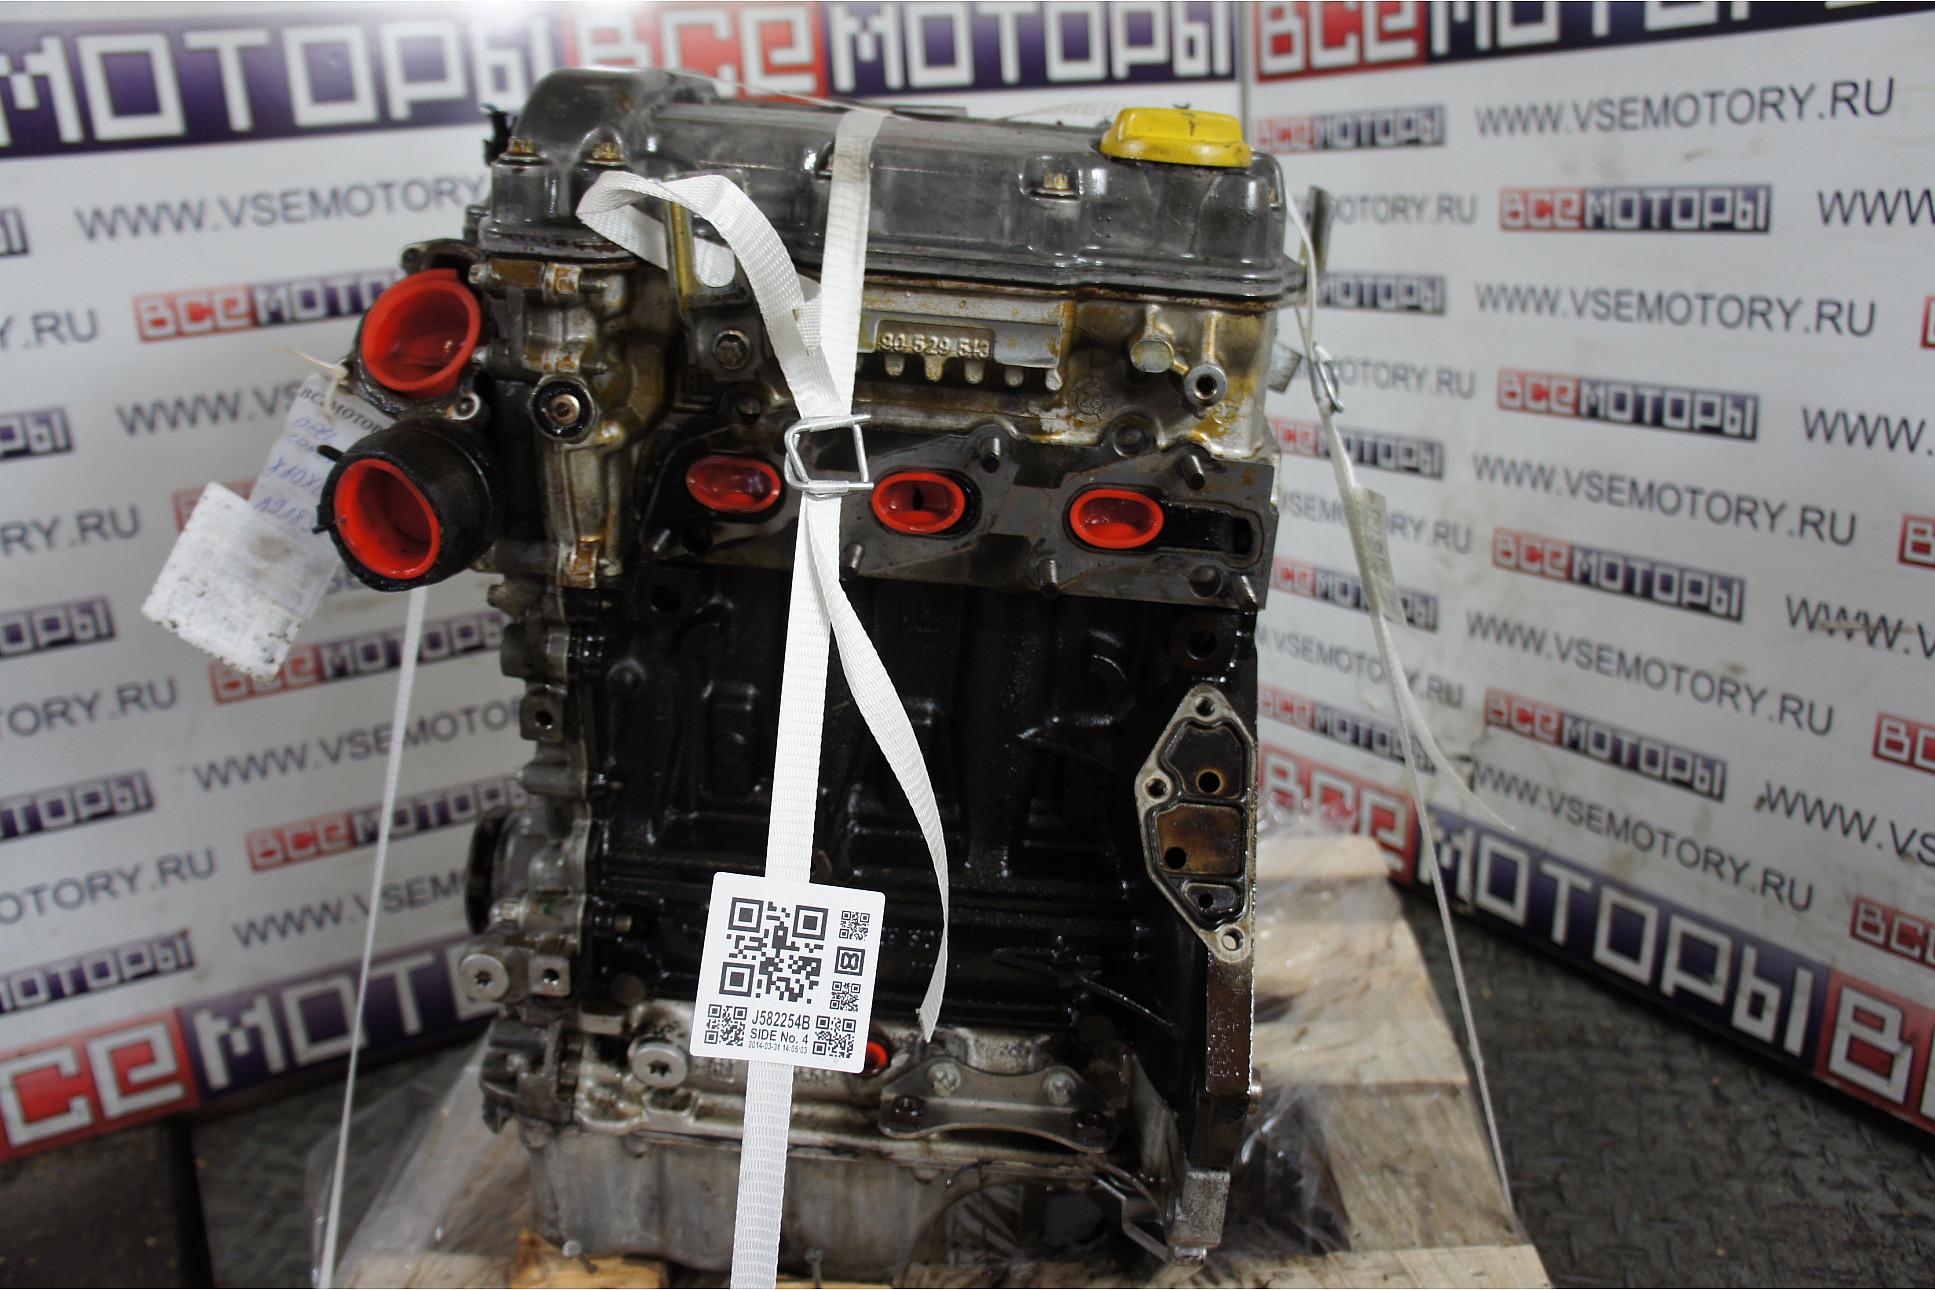 Opel corsa 10 12v x10xe 2000 гв ремонт своими руками